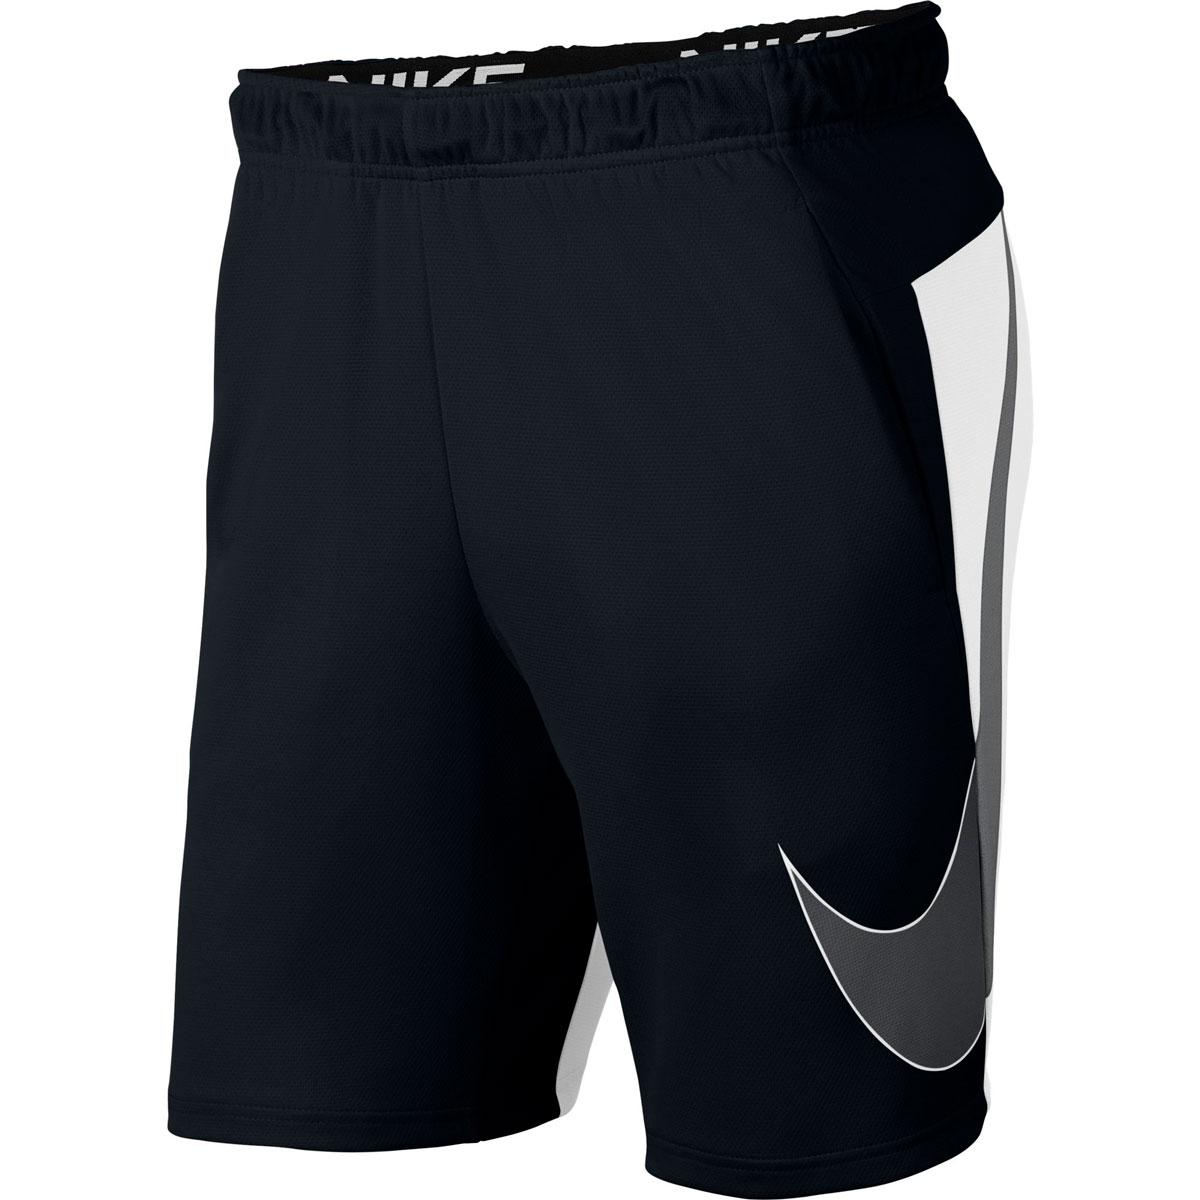 Men's Dri-FIT 5.0 PX GFX Training Shorts, Black, swatch